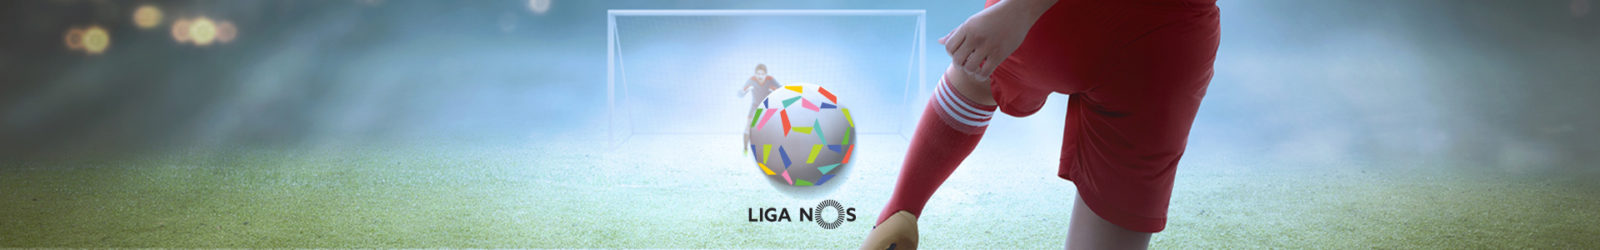 Liga portugalska - Primeira Liga zakłady